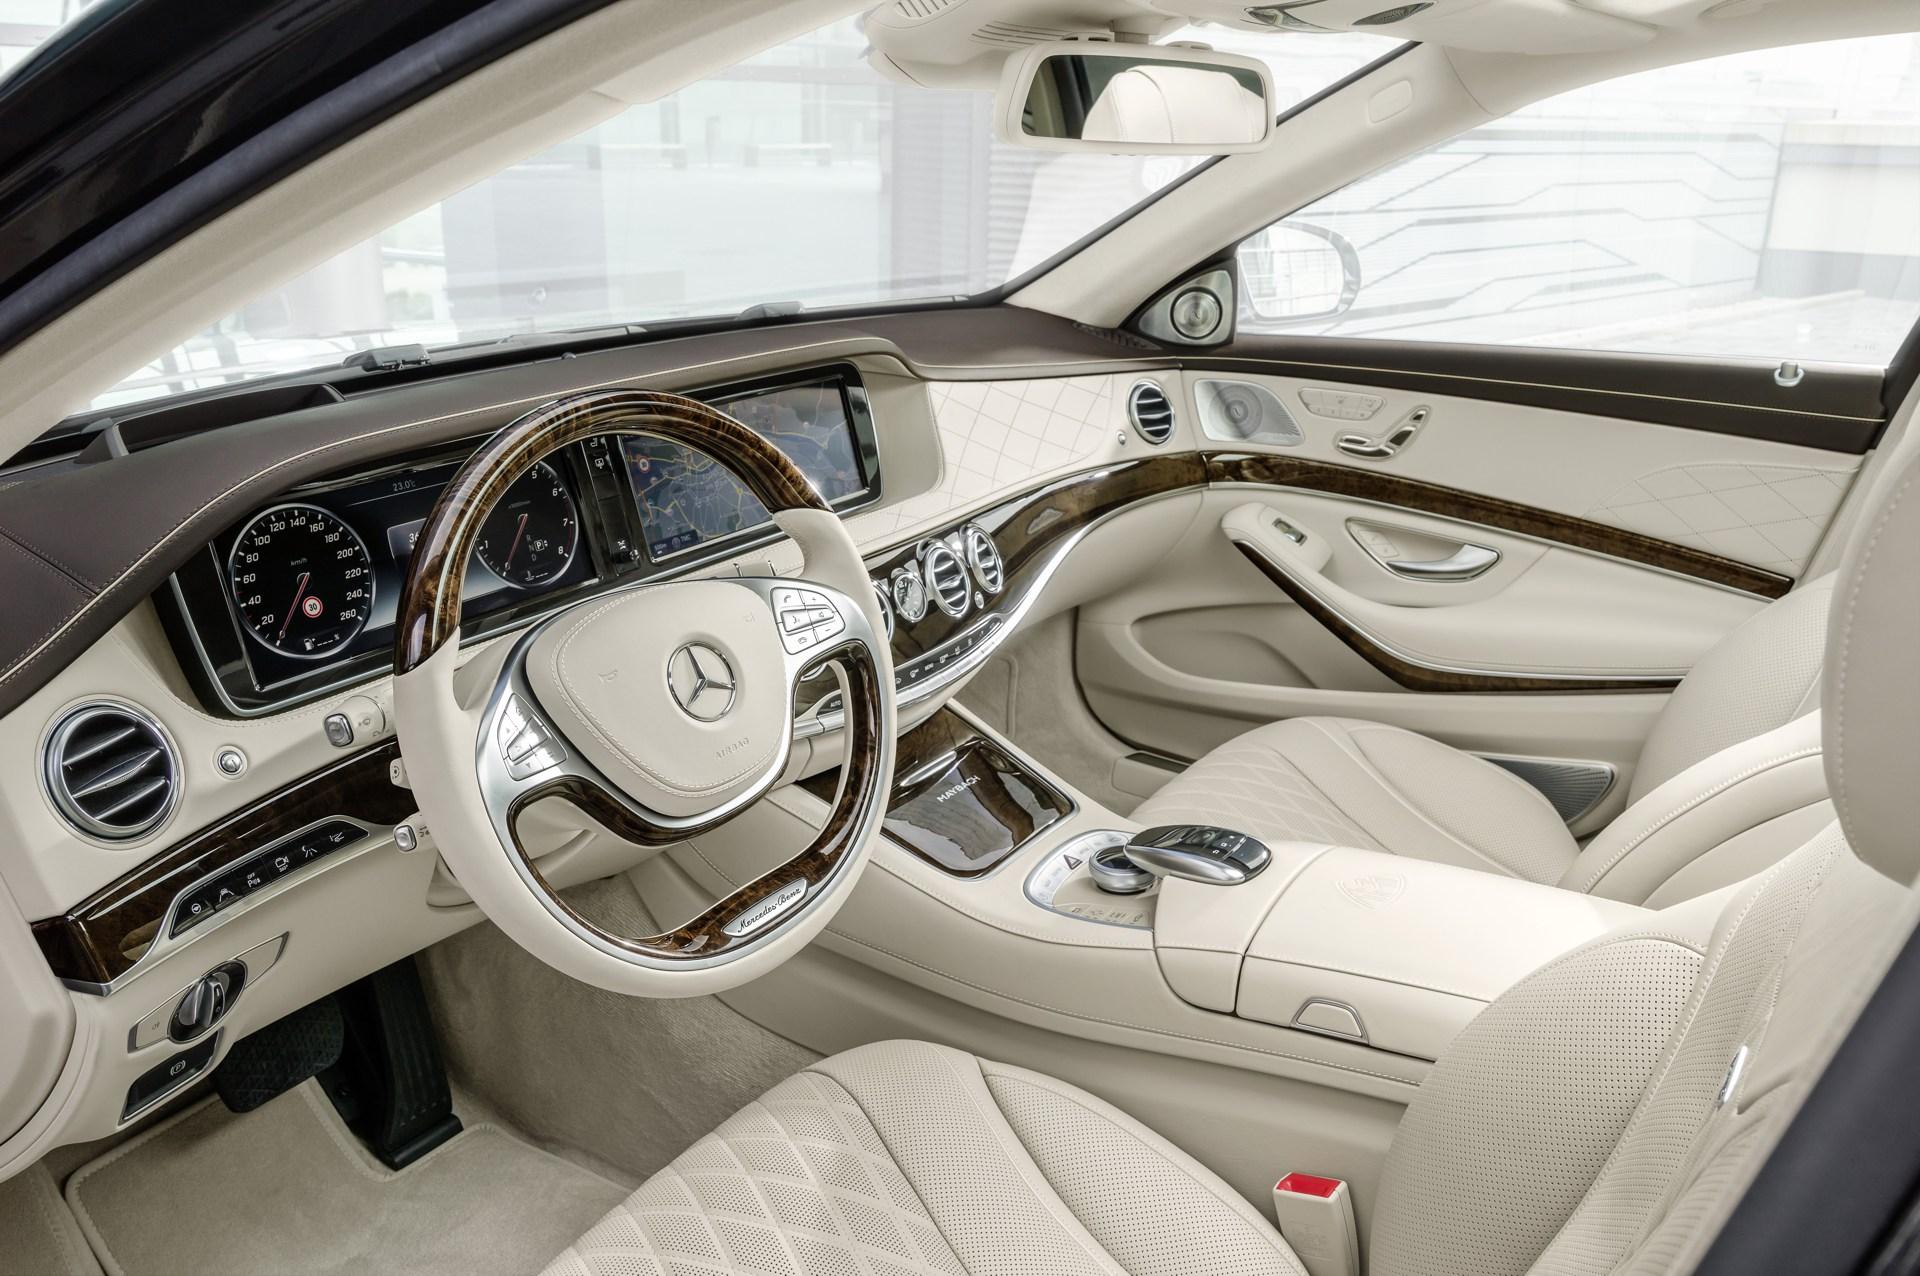 Mercedes-Maybach-Clase-S-2015-interior-03.jpg